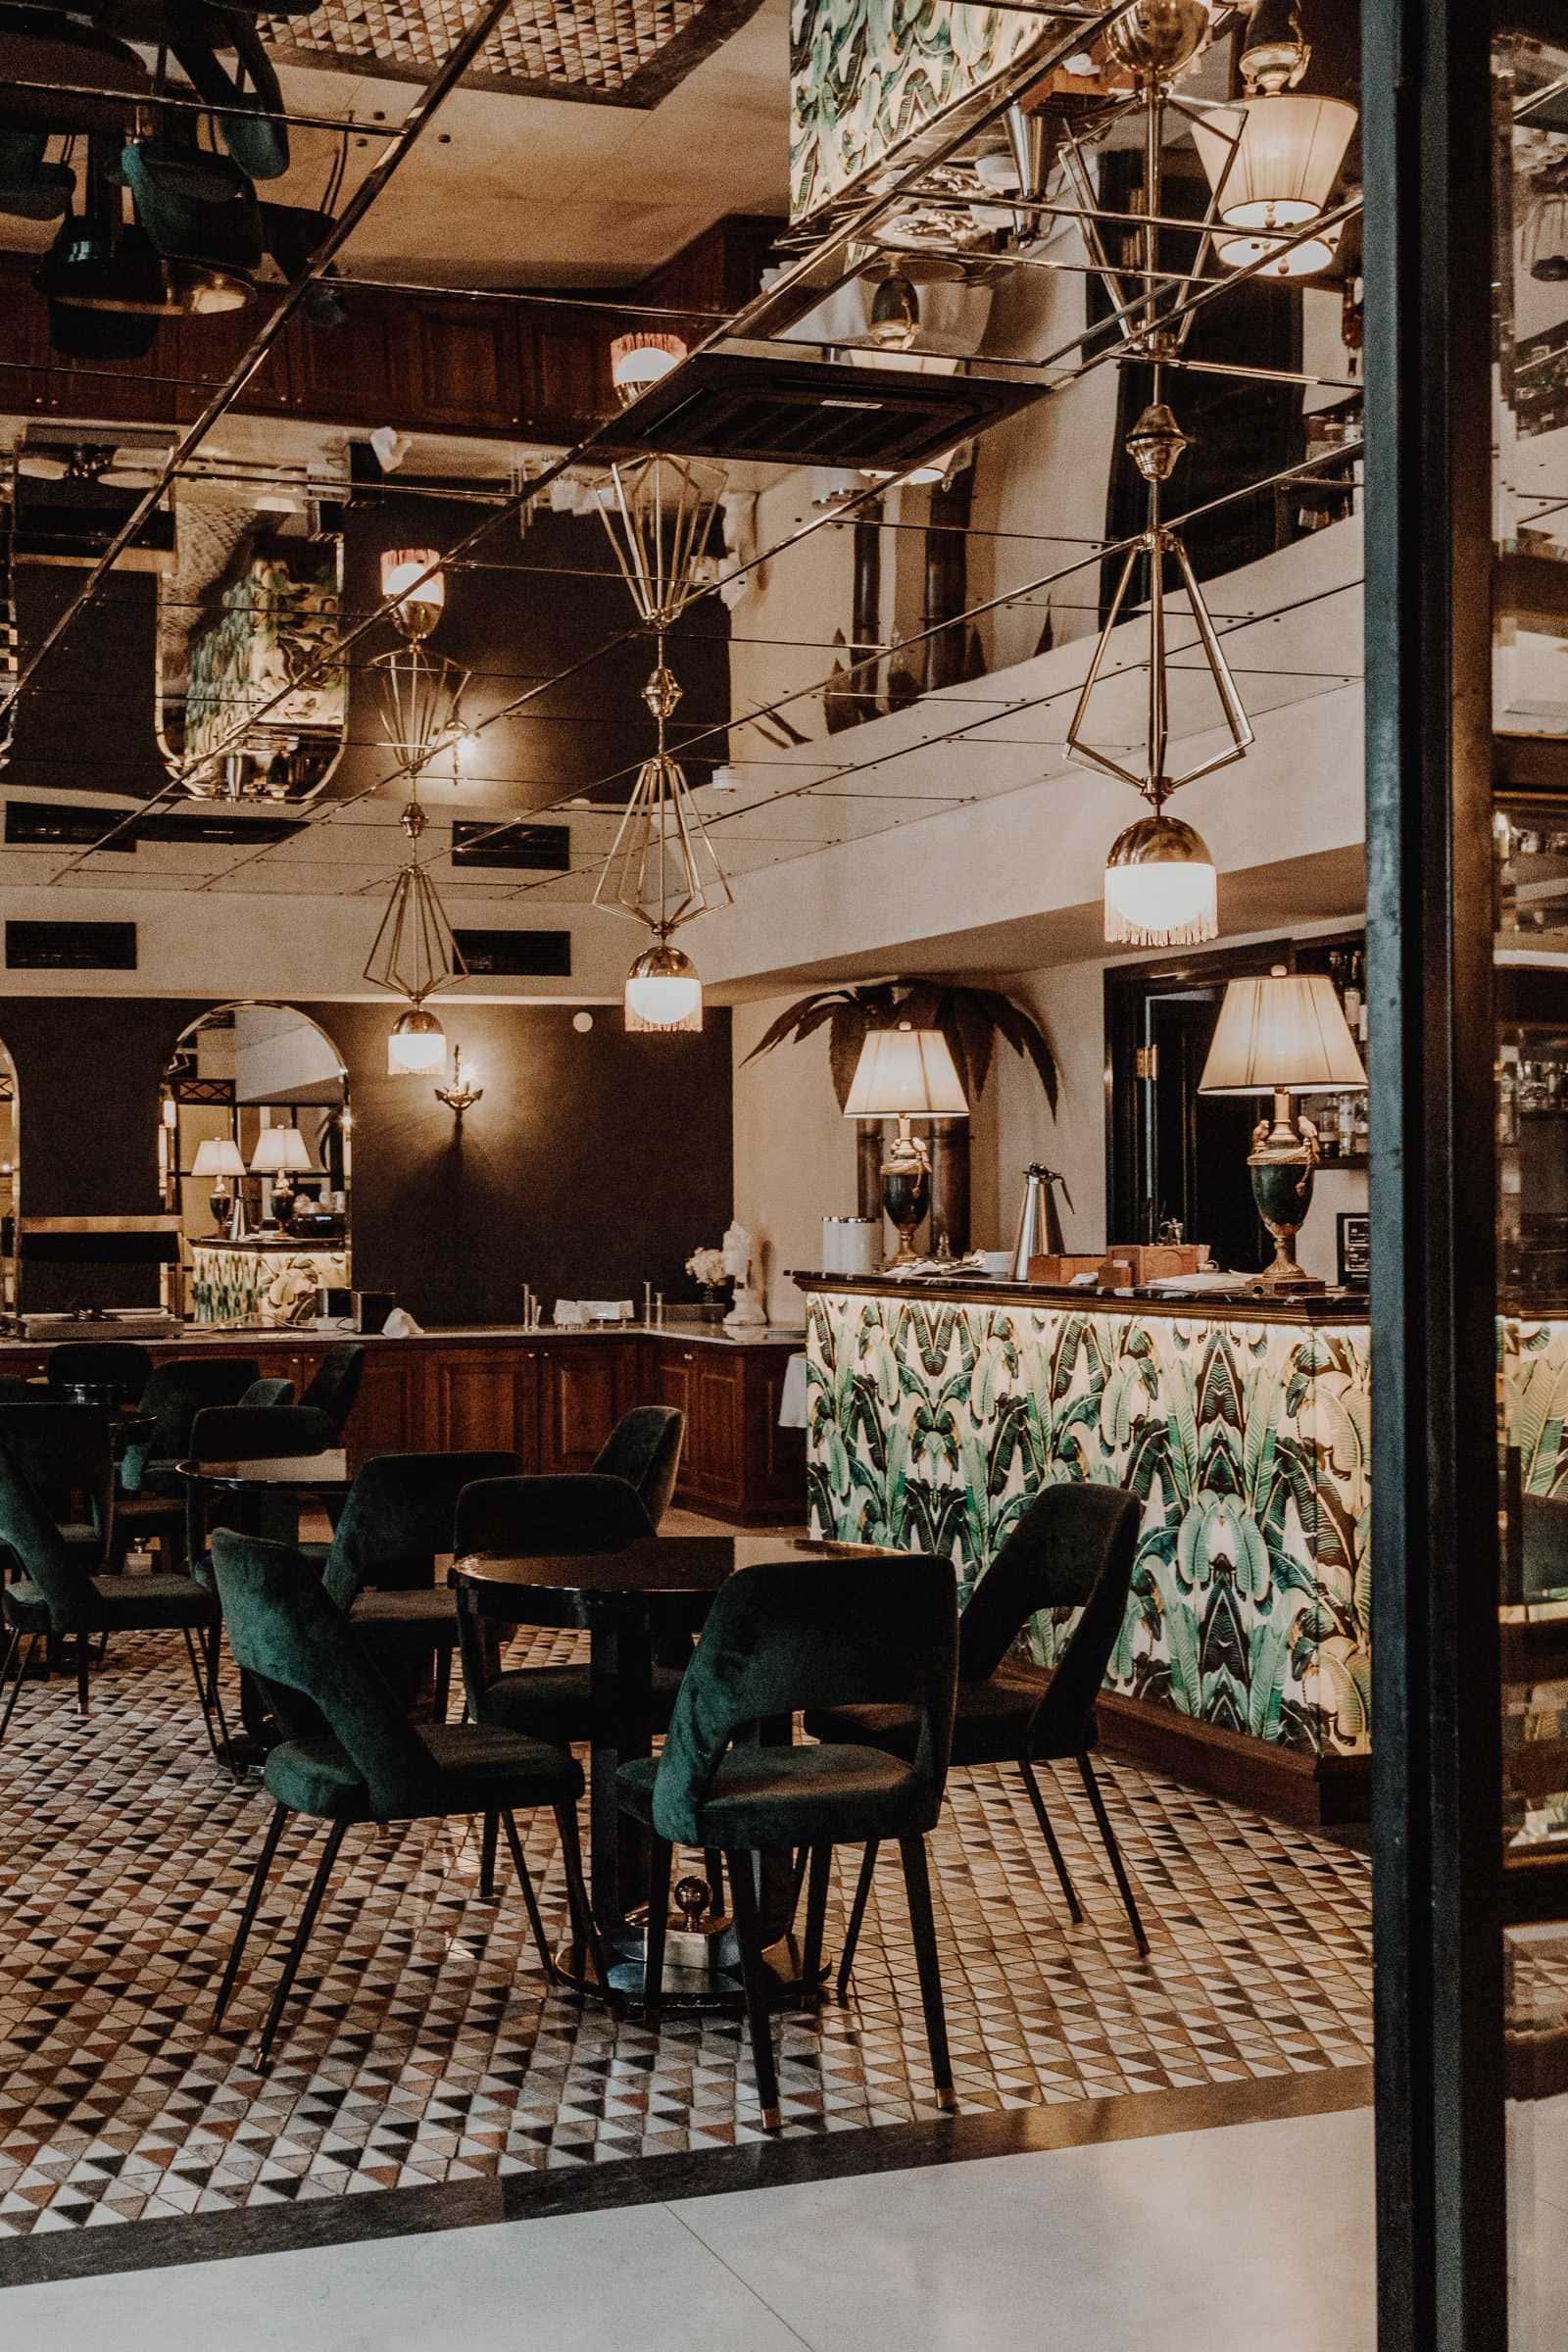 Tiflis Sehenswürdigkeiten Museum Hotel Orbeliani